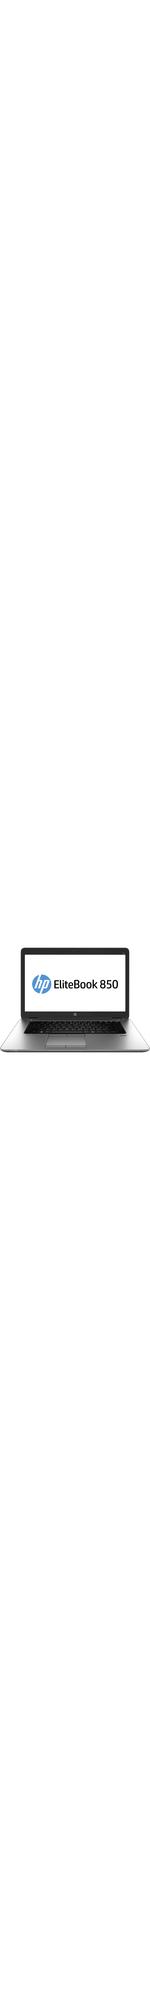 HP EliteBook 850 G1 39.6 cm 15.6And#34; LED Notebook - Intel Core i7 i7-4600U 2.10 GHz